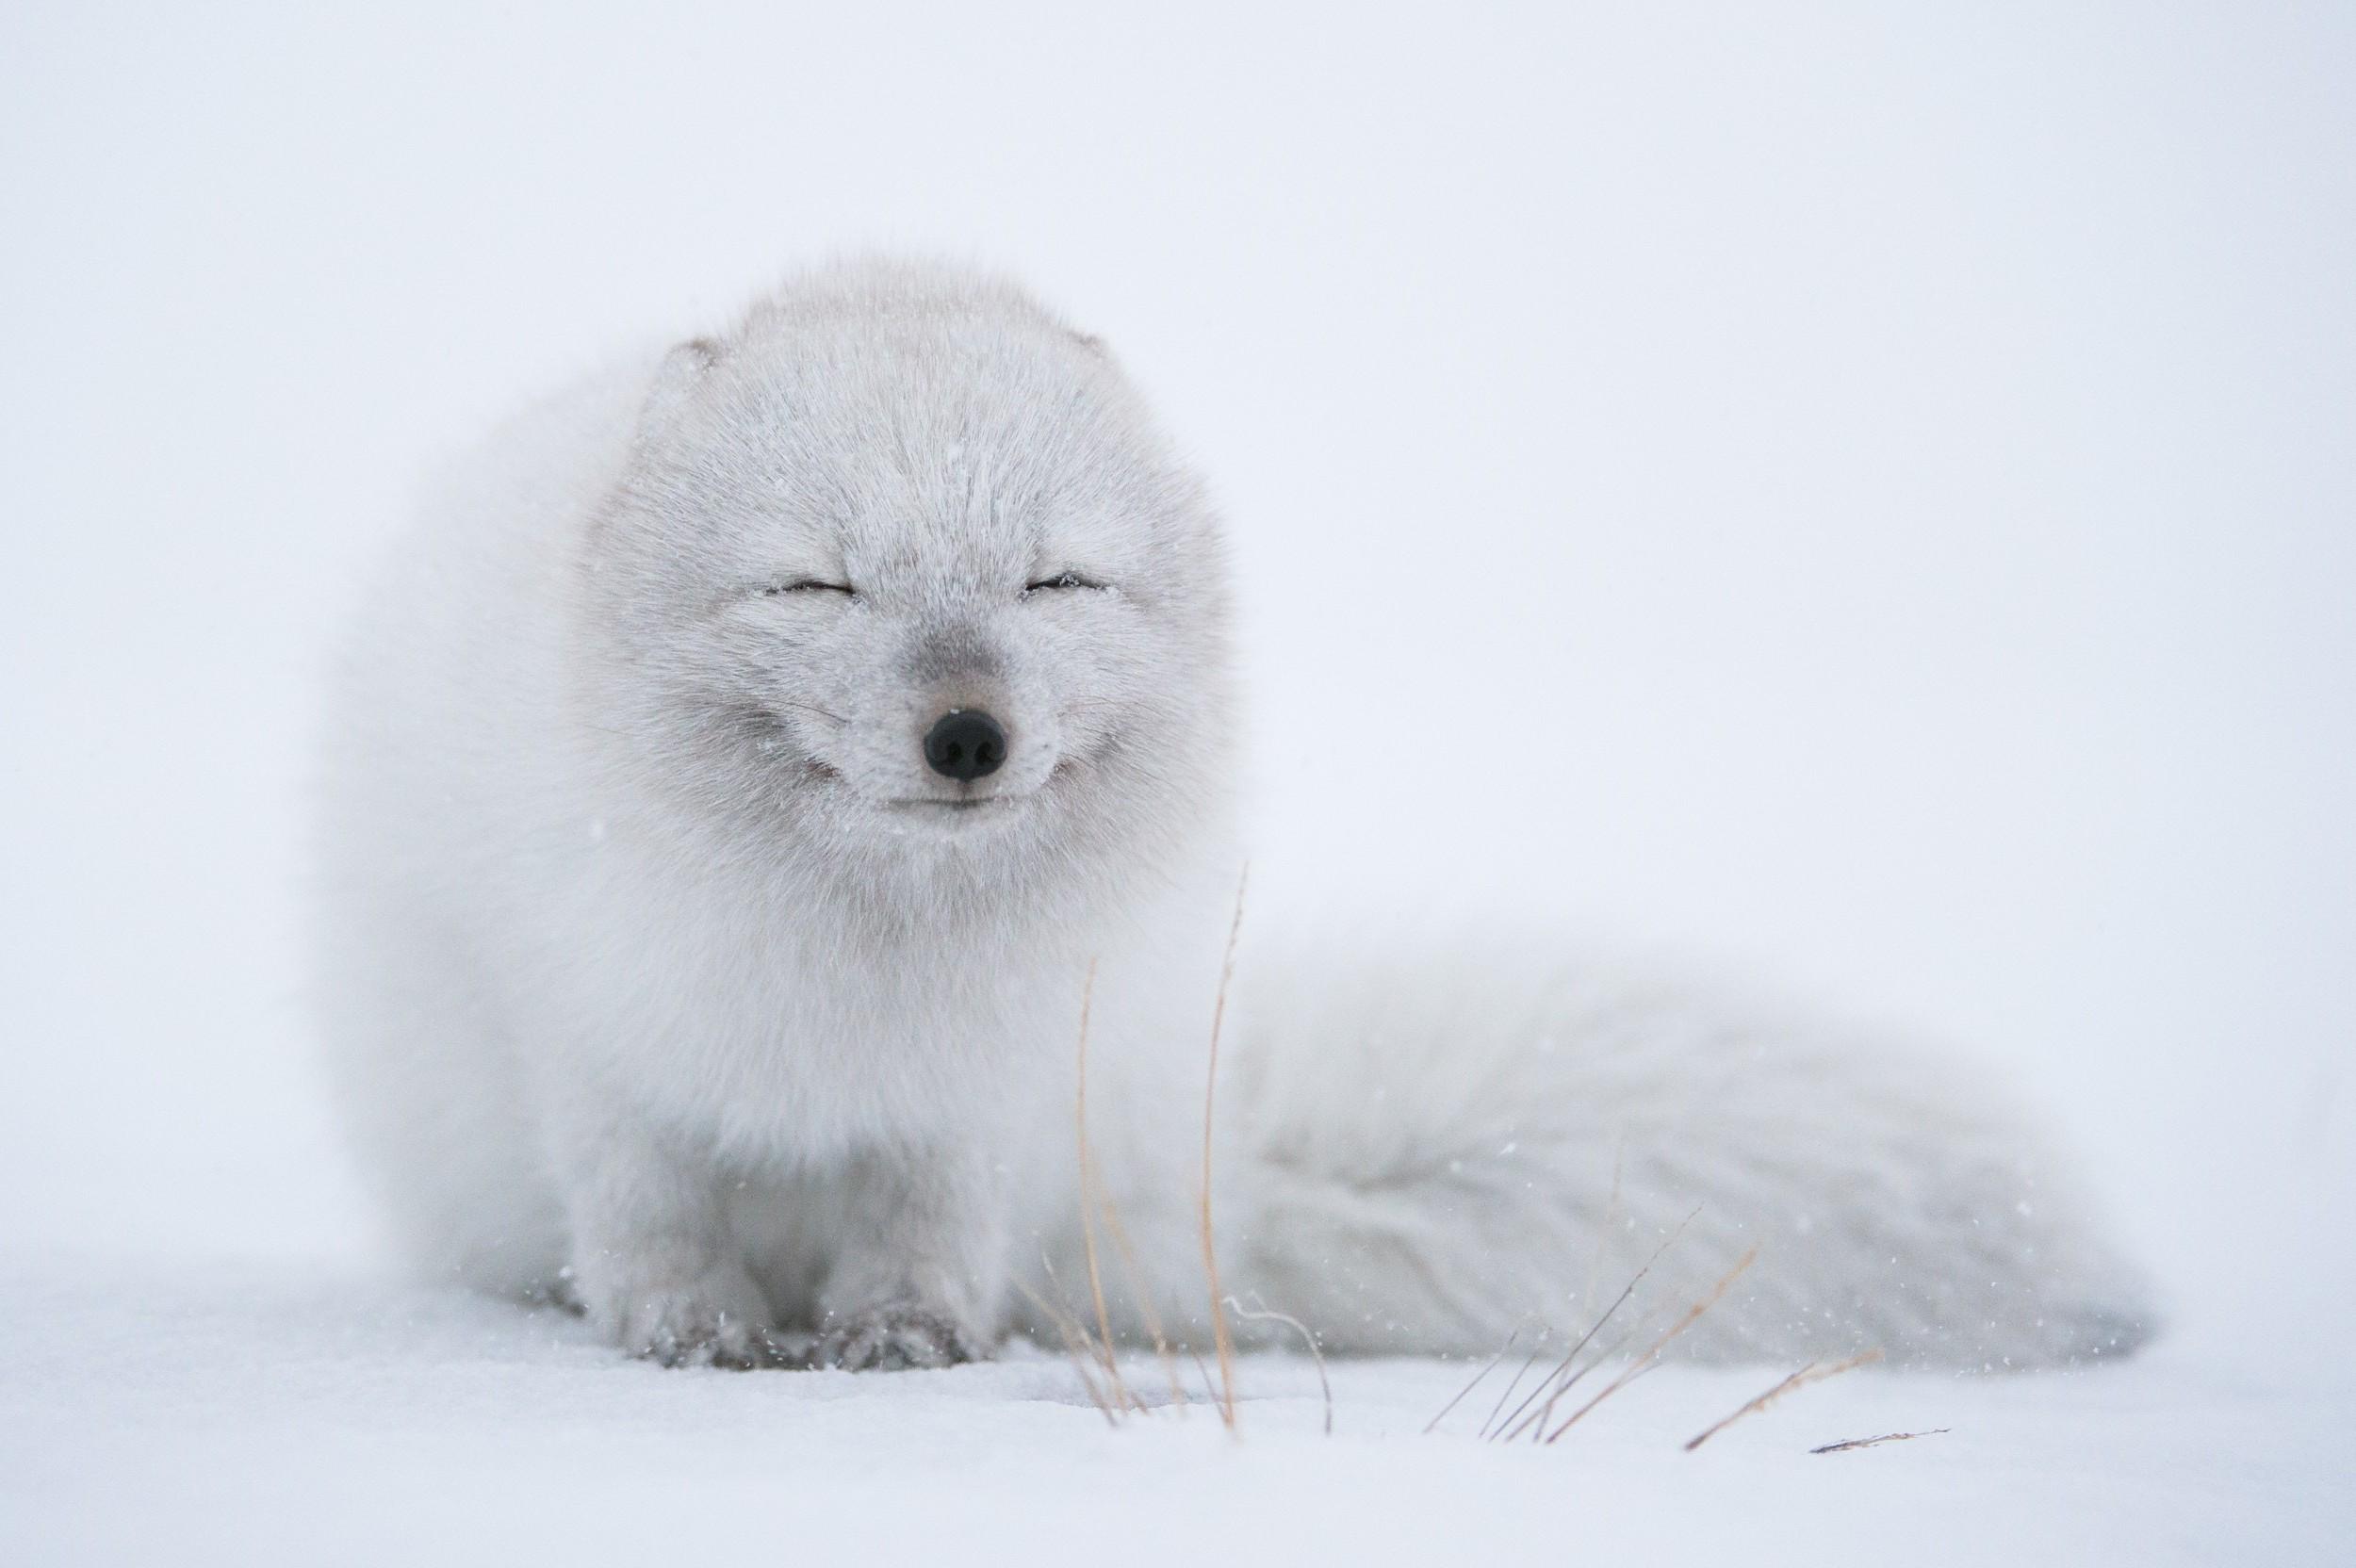 Sfondi Bianca Animali La Neve Inverno Natura Pelliccia